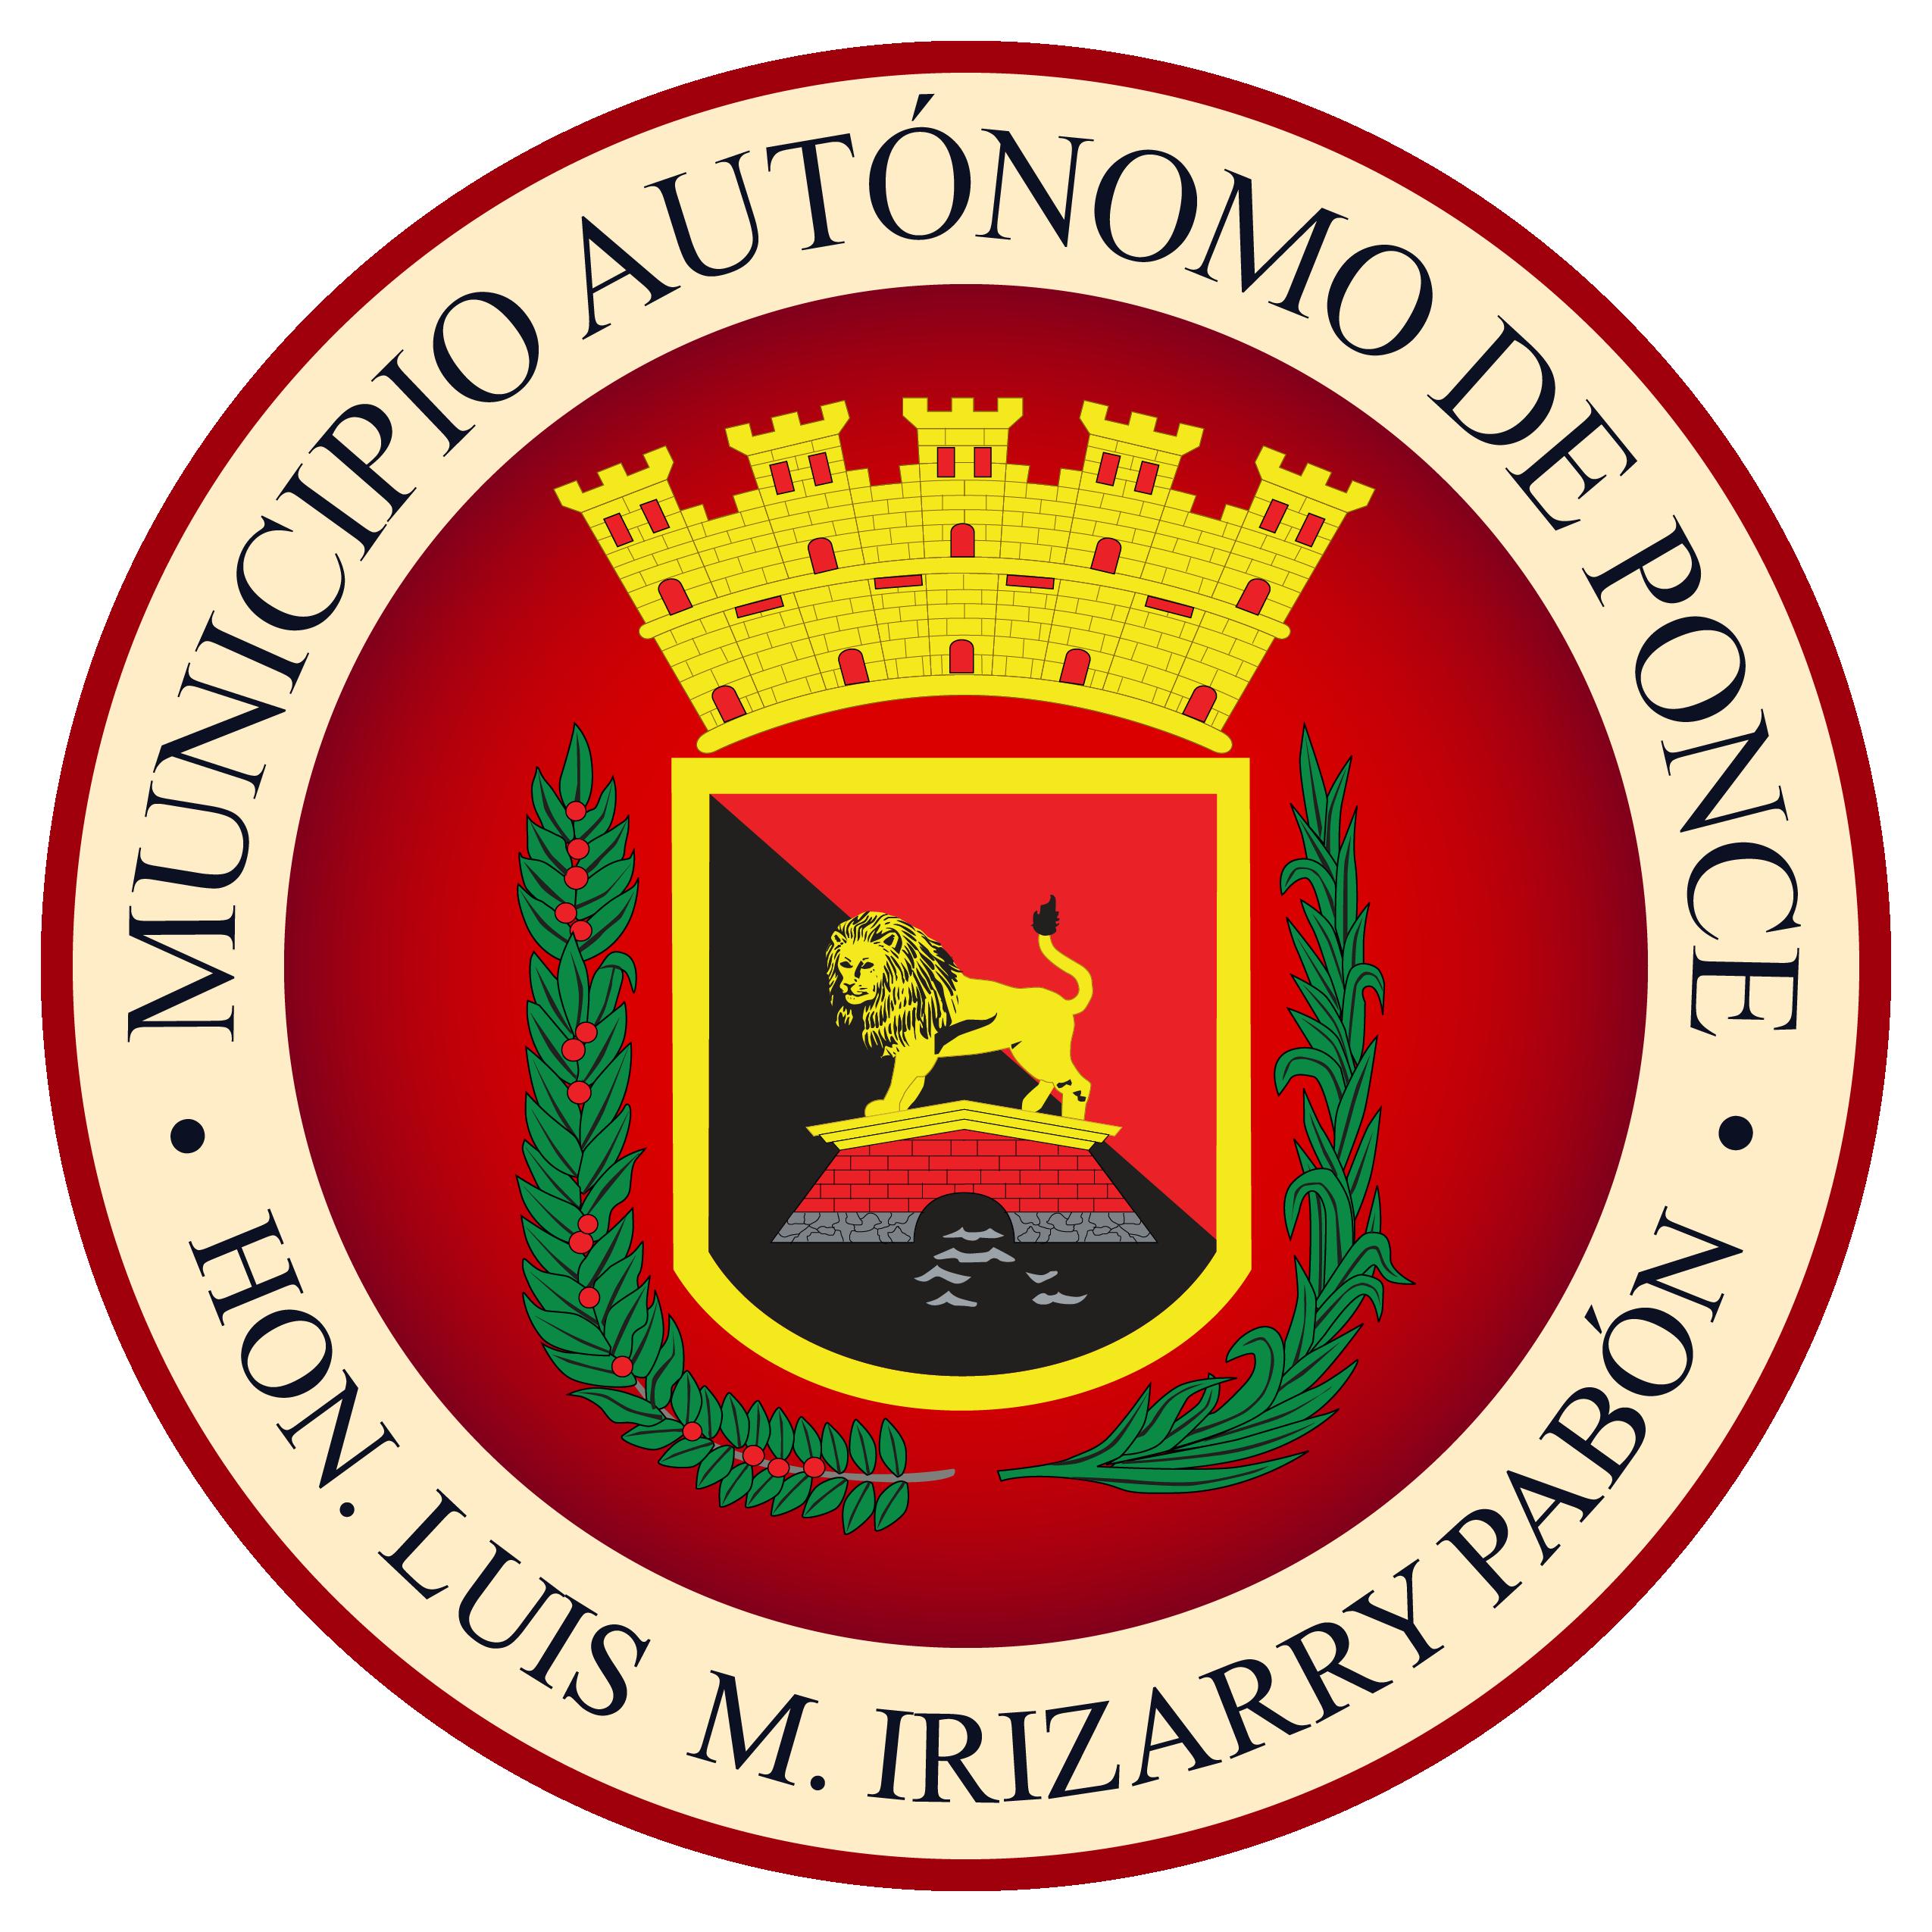 Visit Ponce